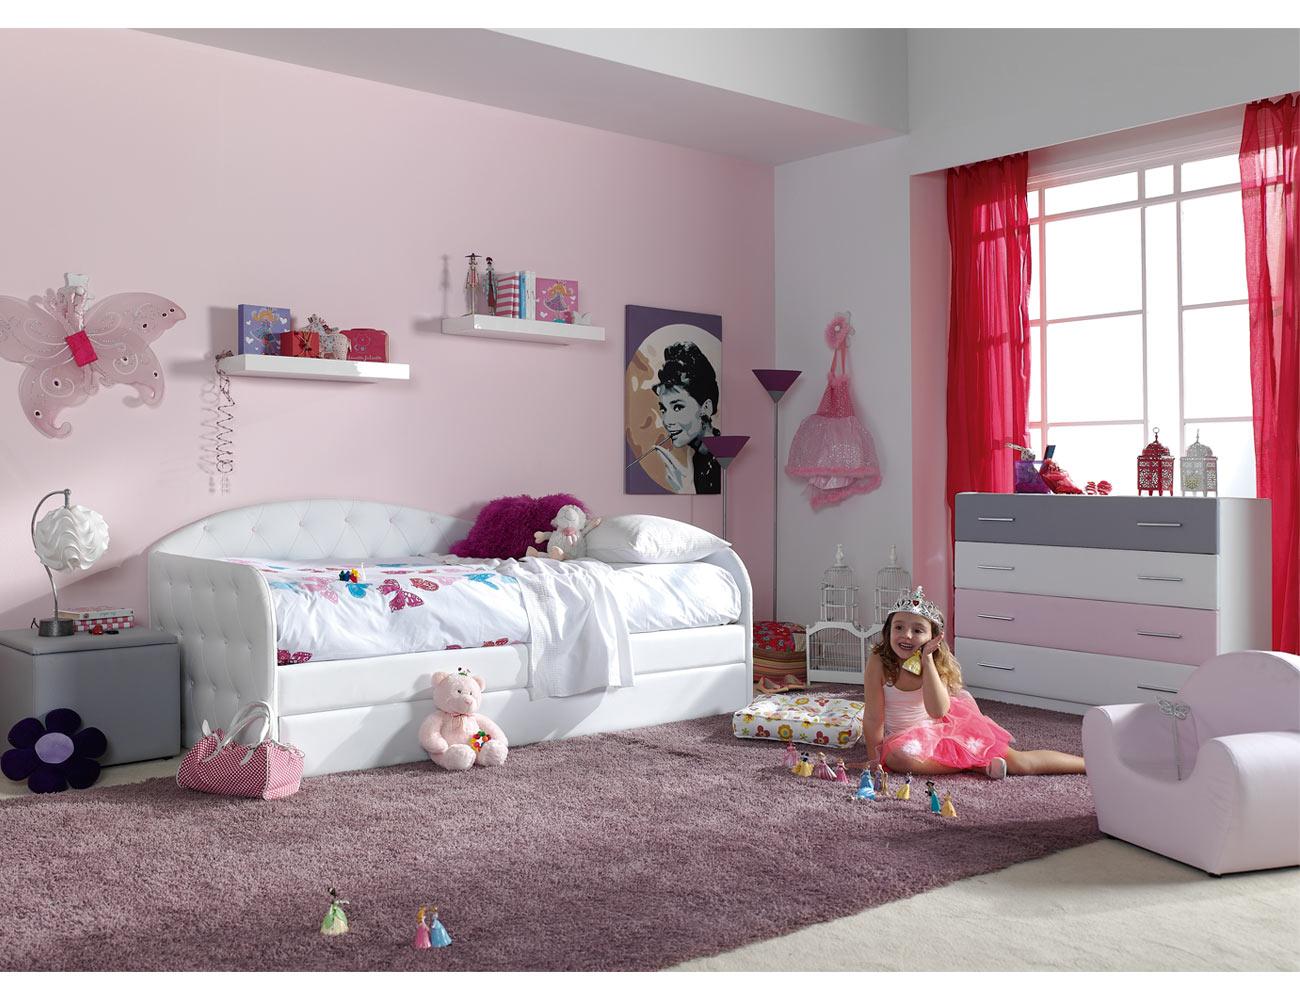 243 cama nido12